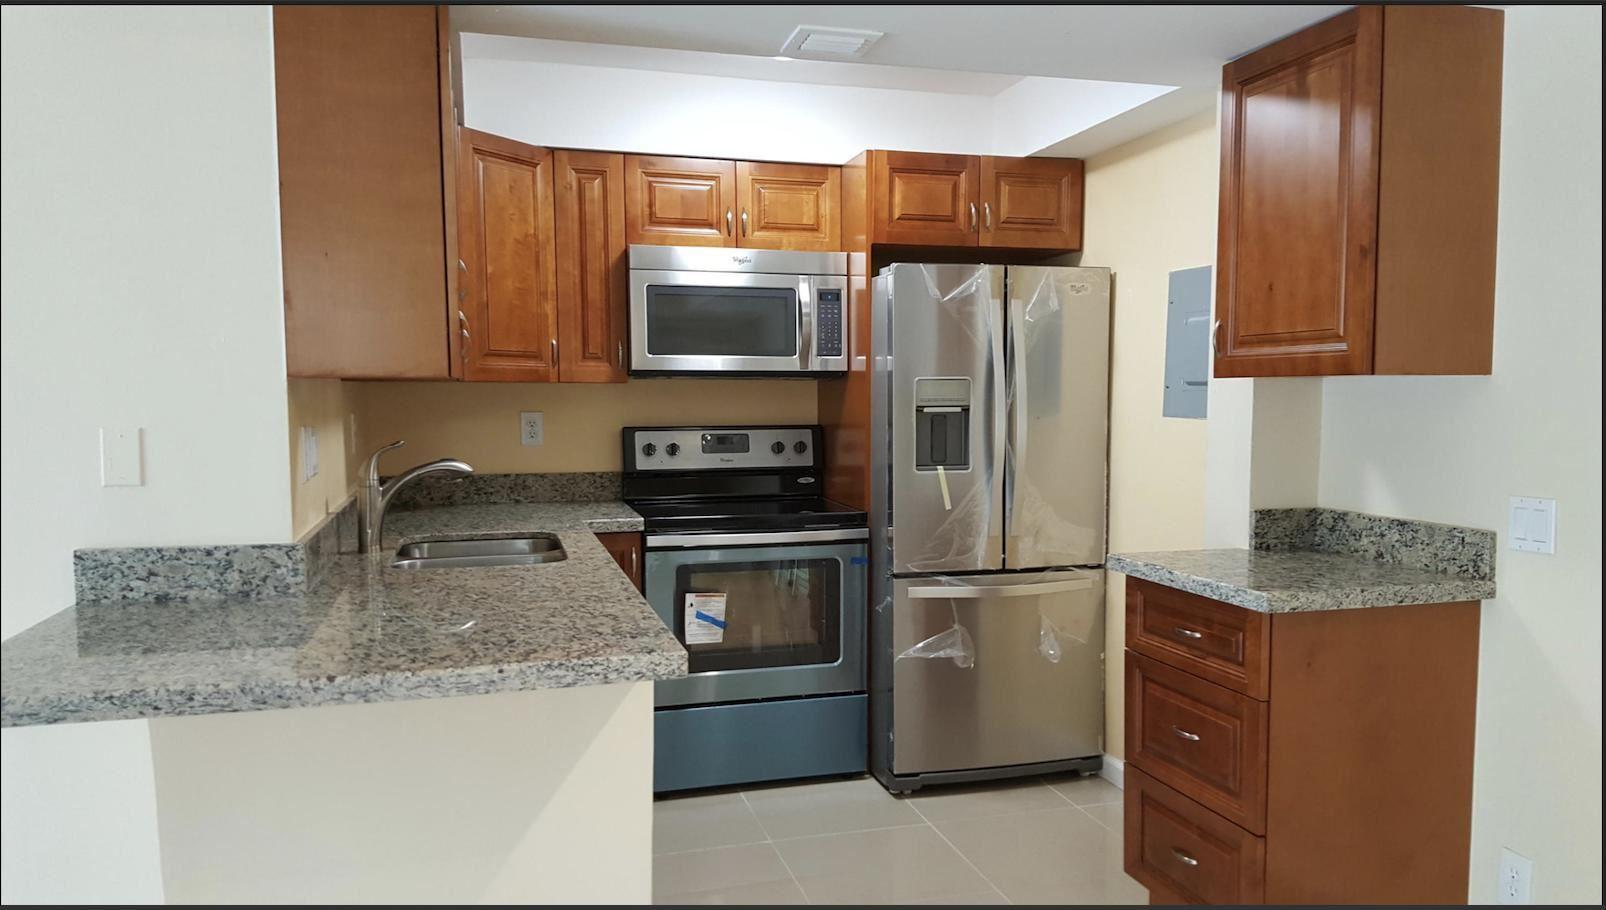 724 Executive Center Drive #32, West Palm Beach, FL 33401 - #: RX-10612790